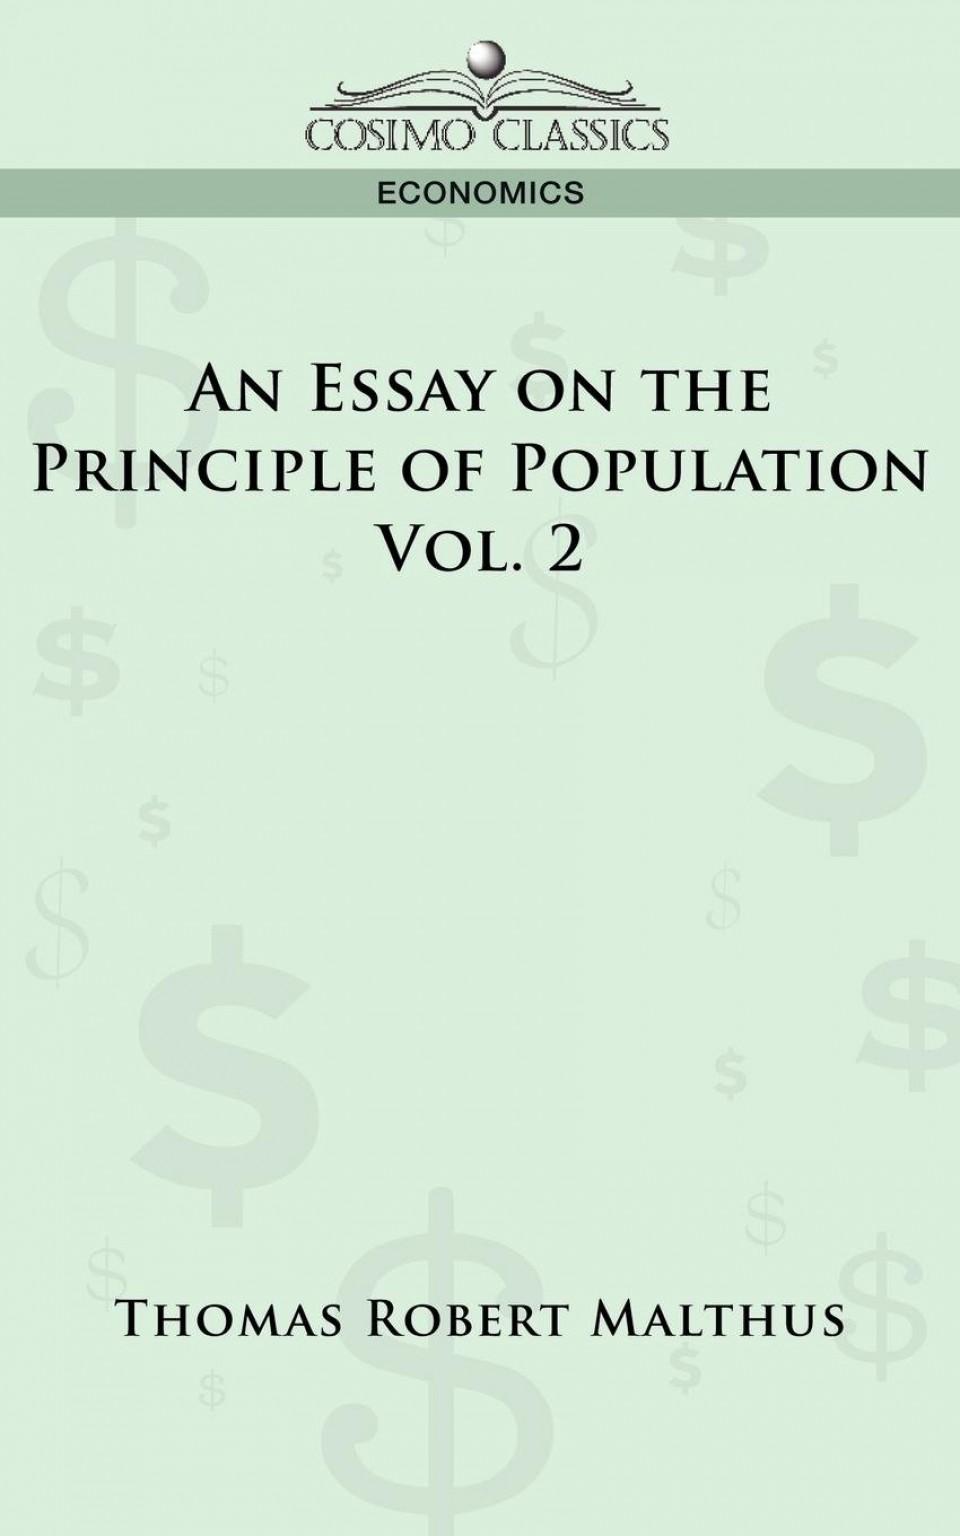 009 Essay On The Principle Of Population Example Singular Malthus Sparknotes Thomas Main Idea 960